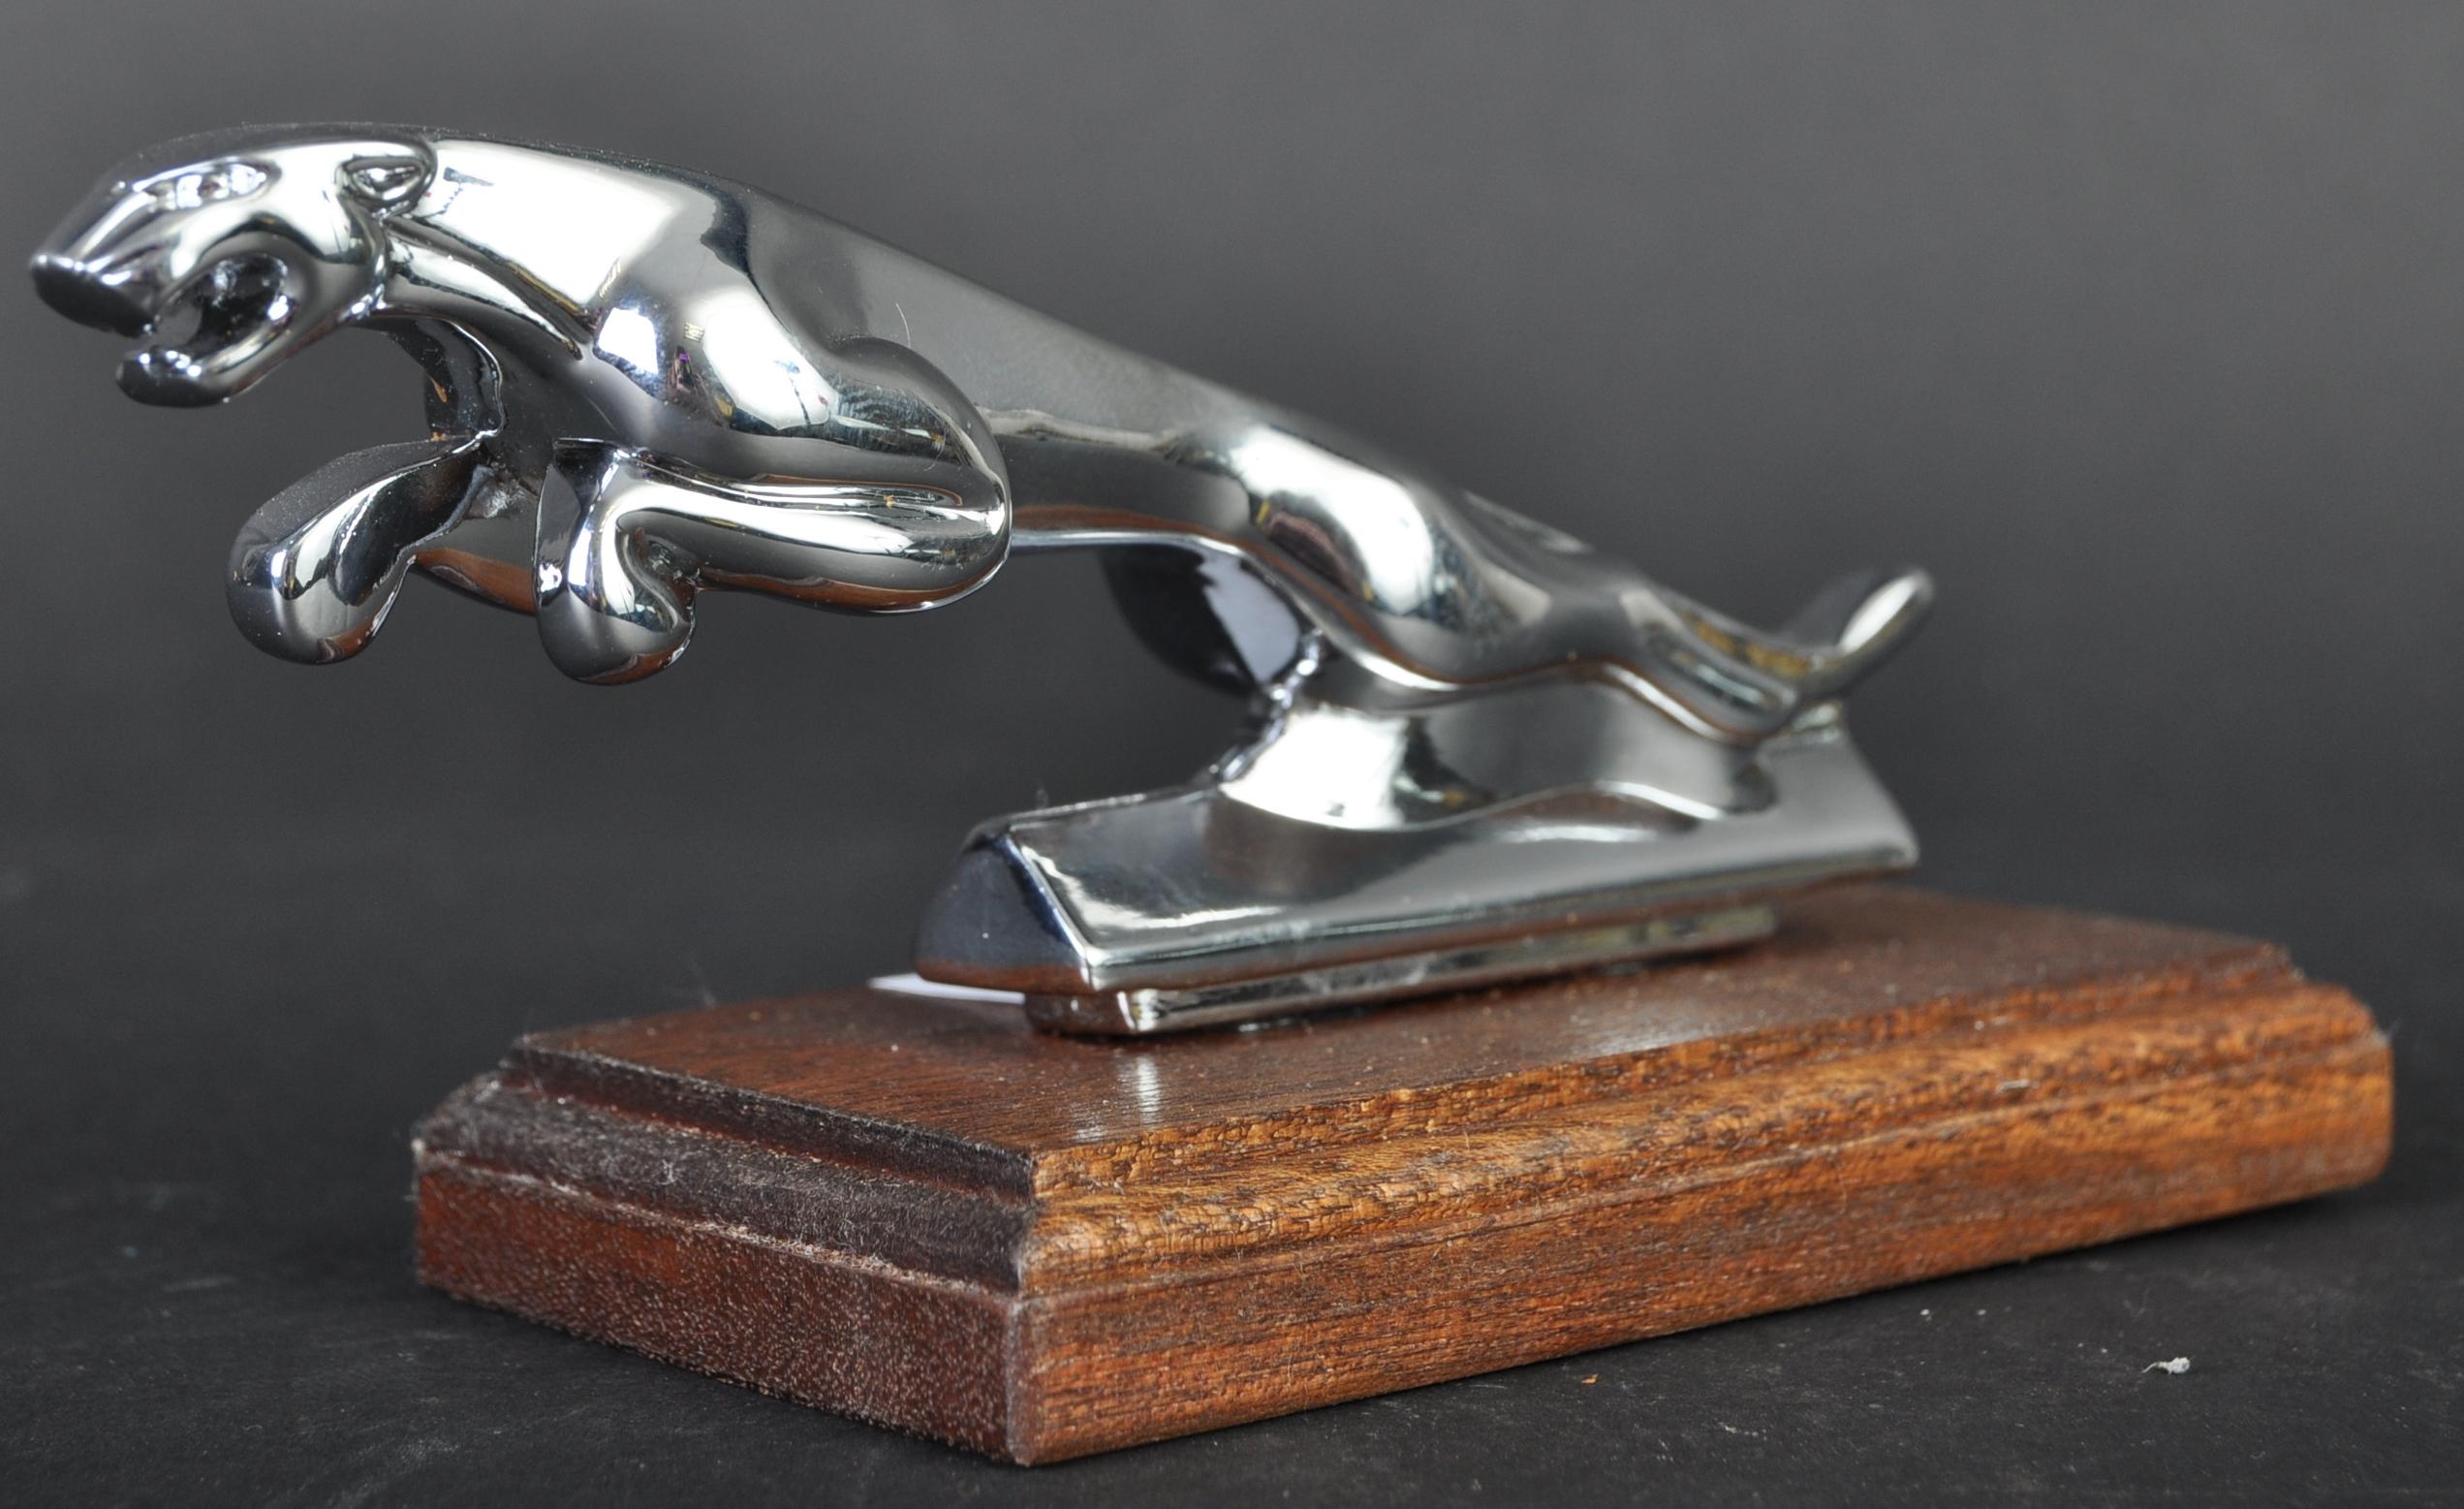 JAGUAR MASCOT - ORIGINAL SMALLER VERSION MADE FOR SCOOTERS